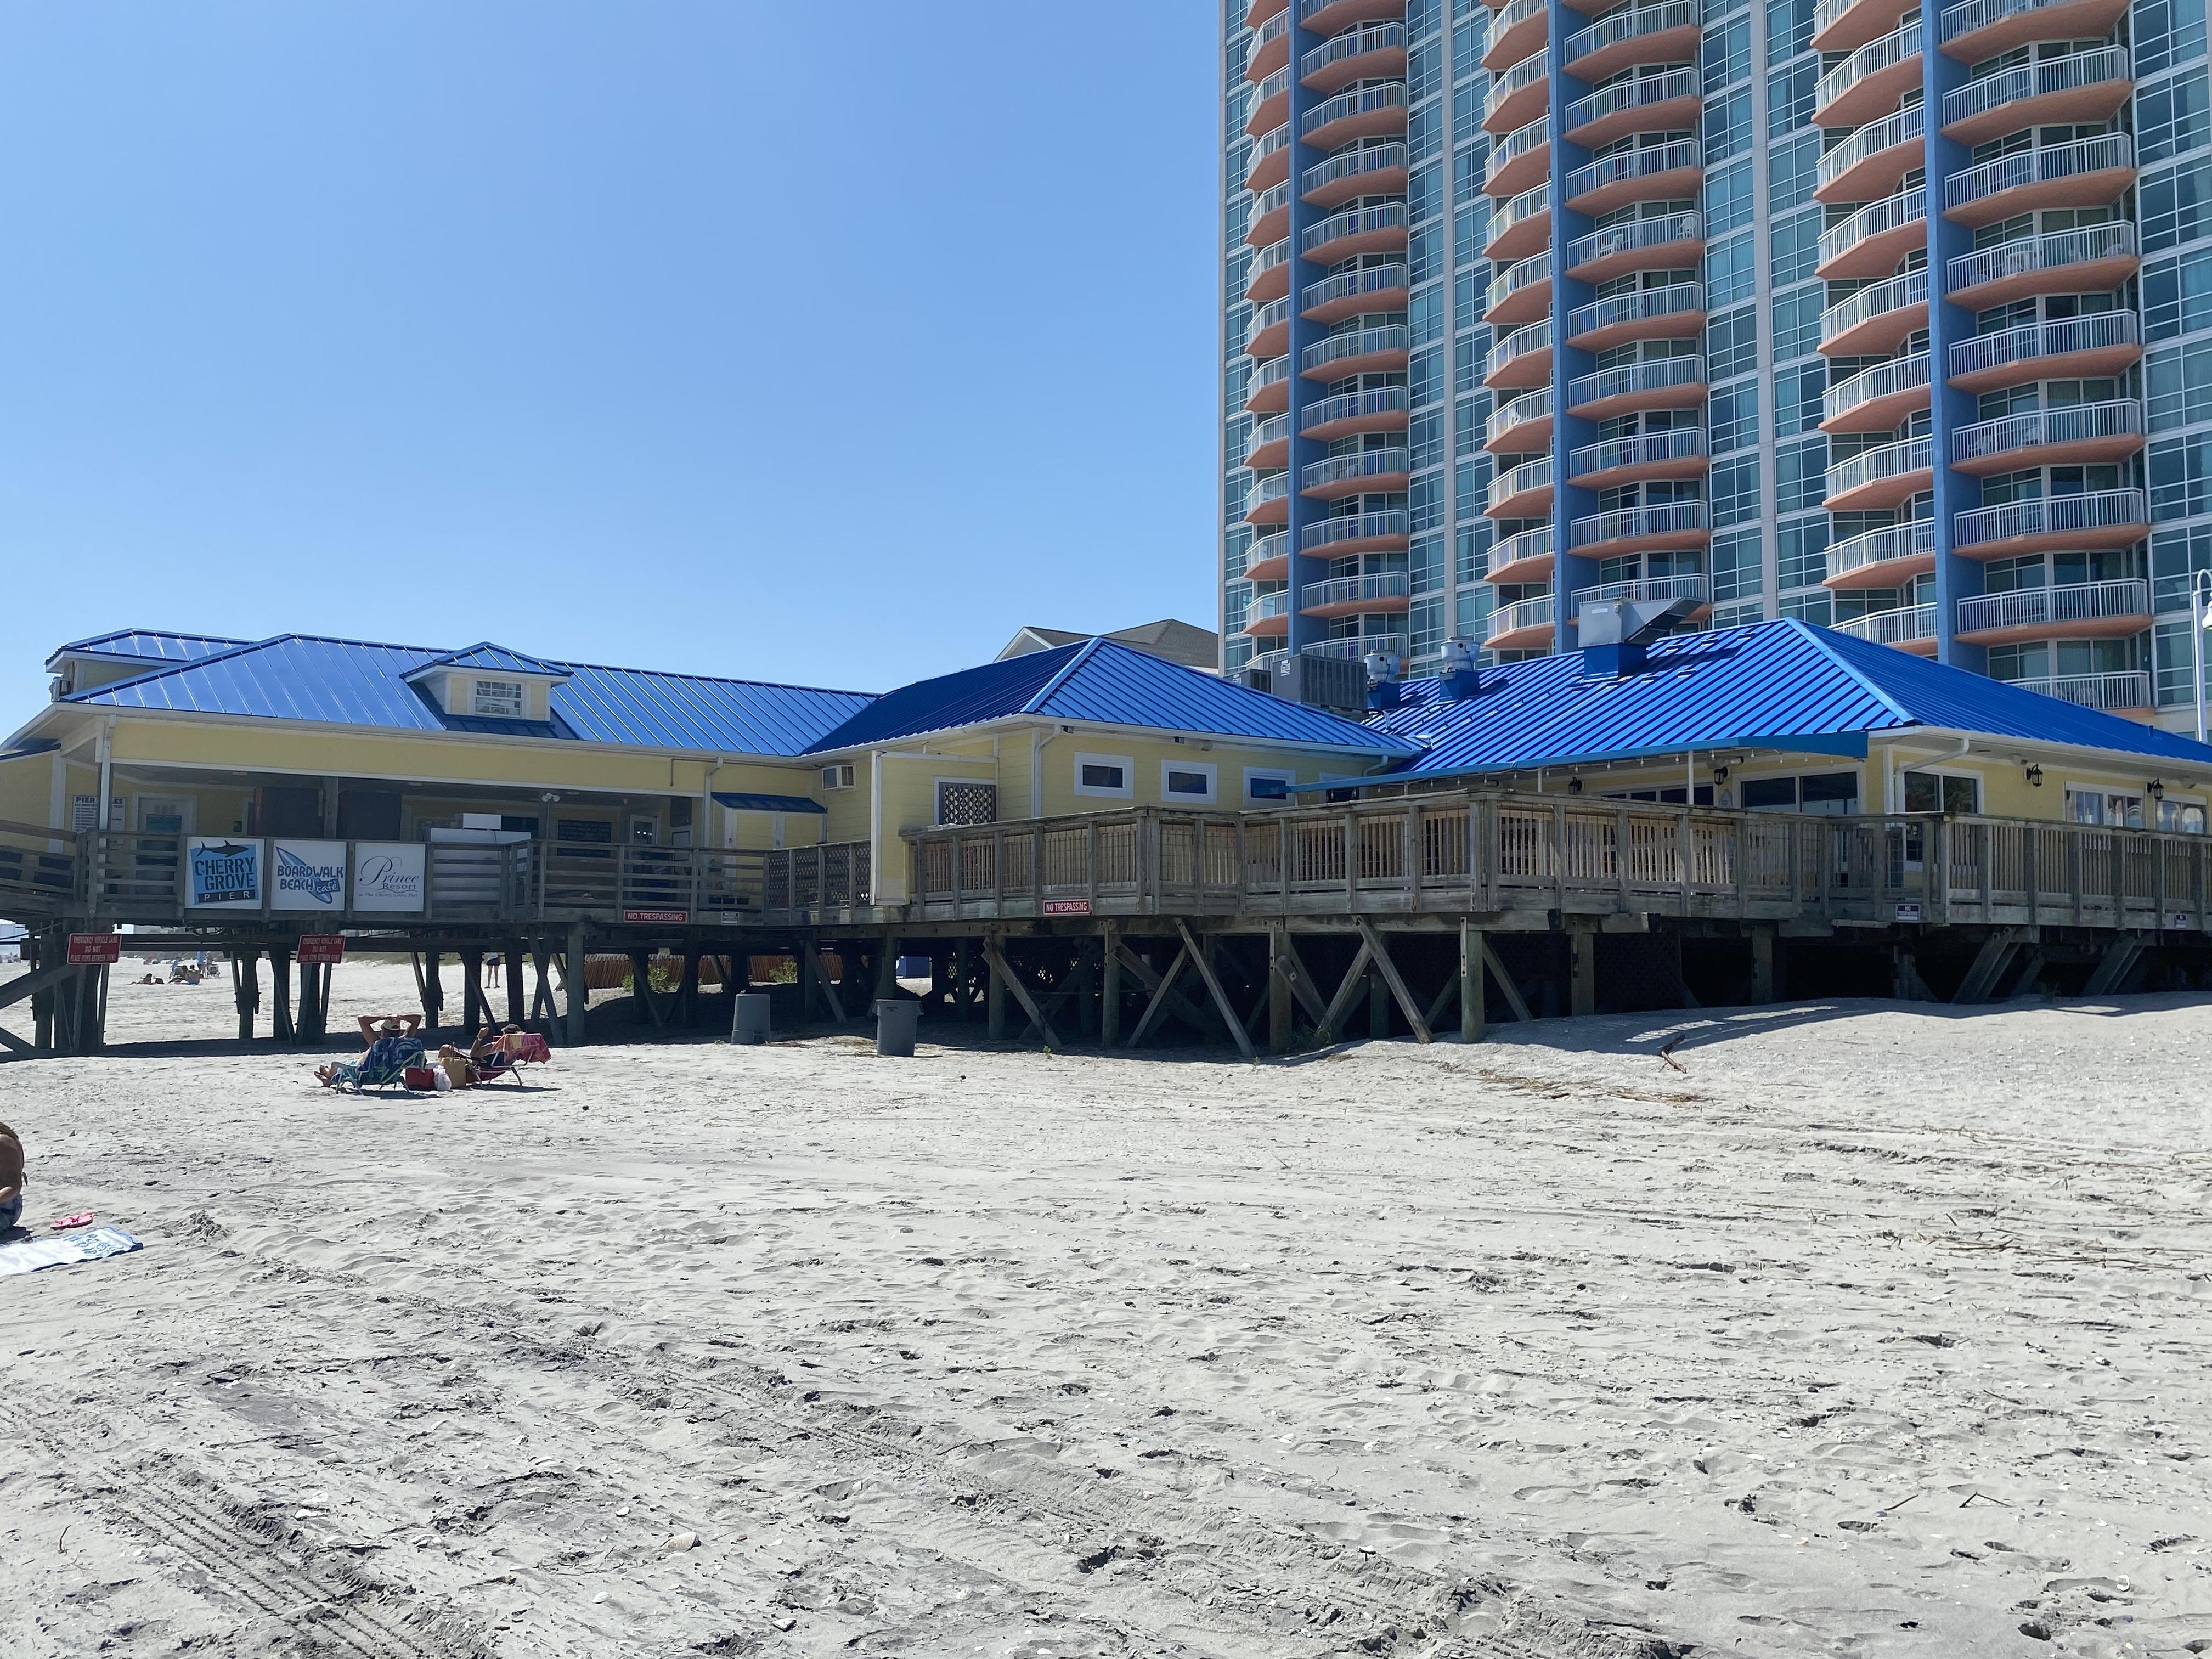 Boardwalk Beach Cafe - Cherry Grove Pier